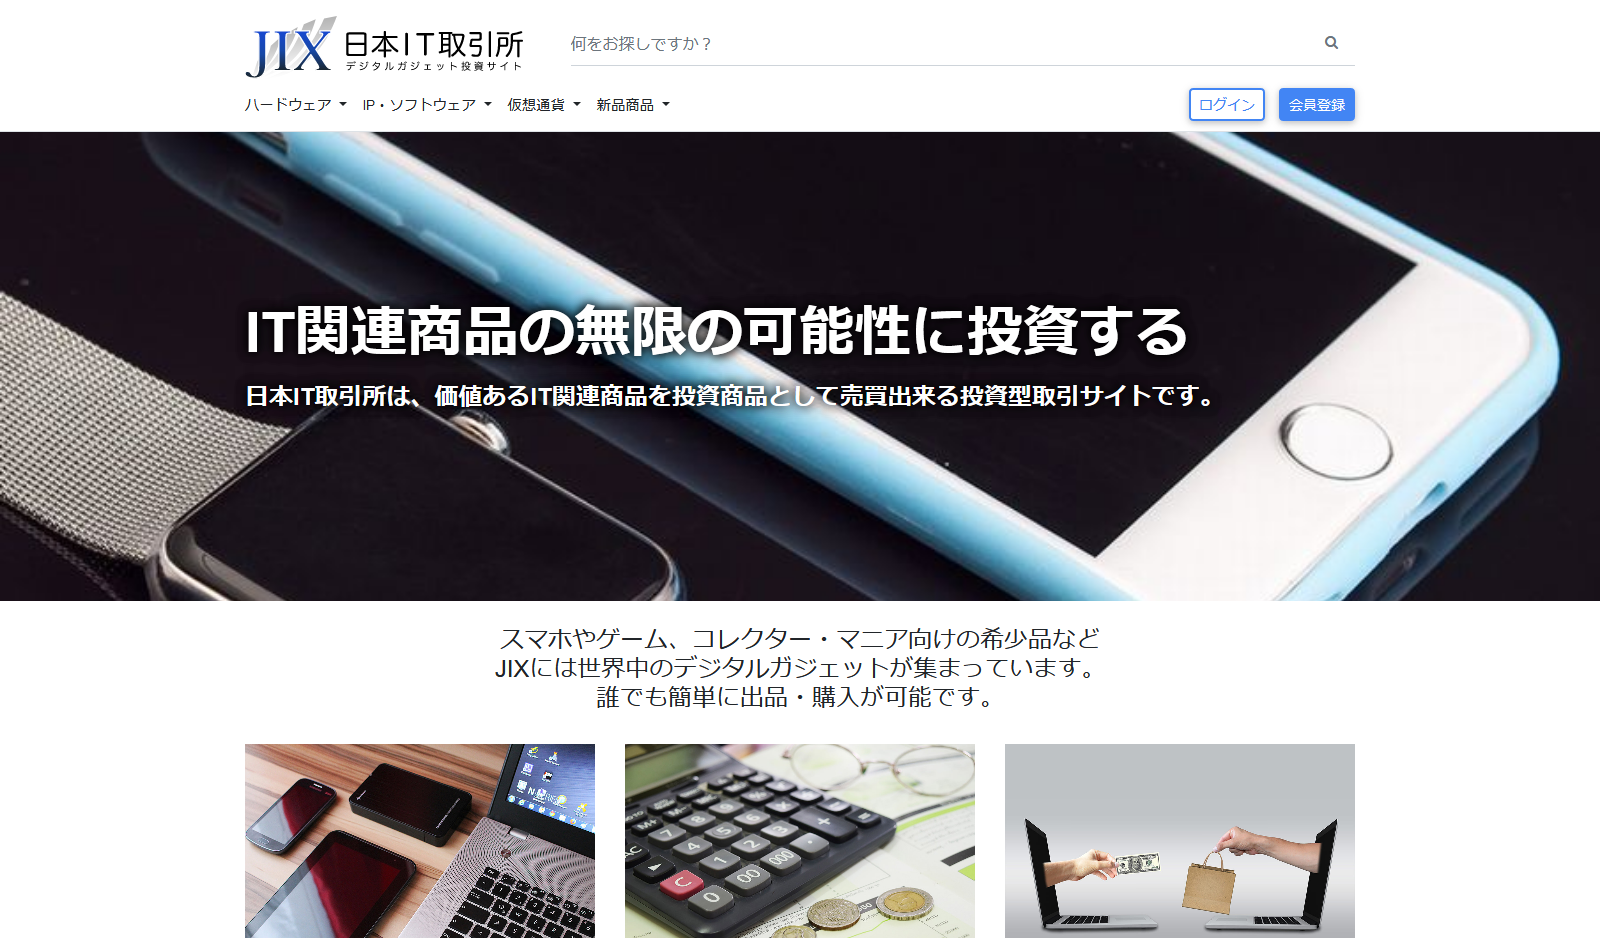 JIX-日本IT取引所 - デジタルガジェット投資サイト